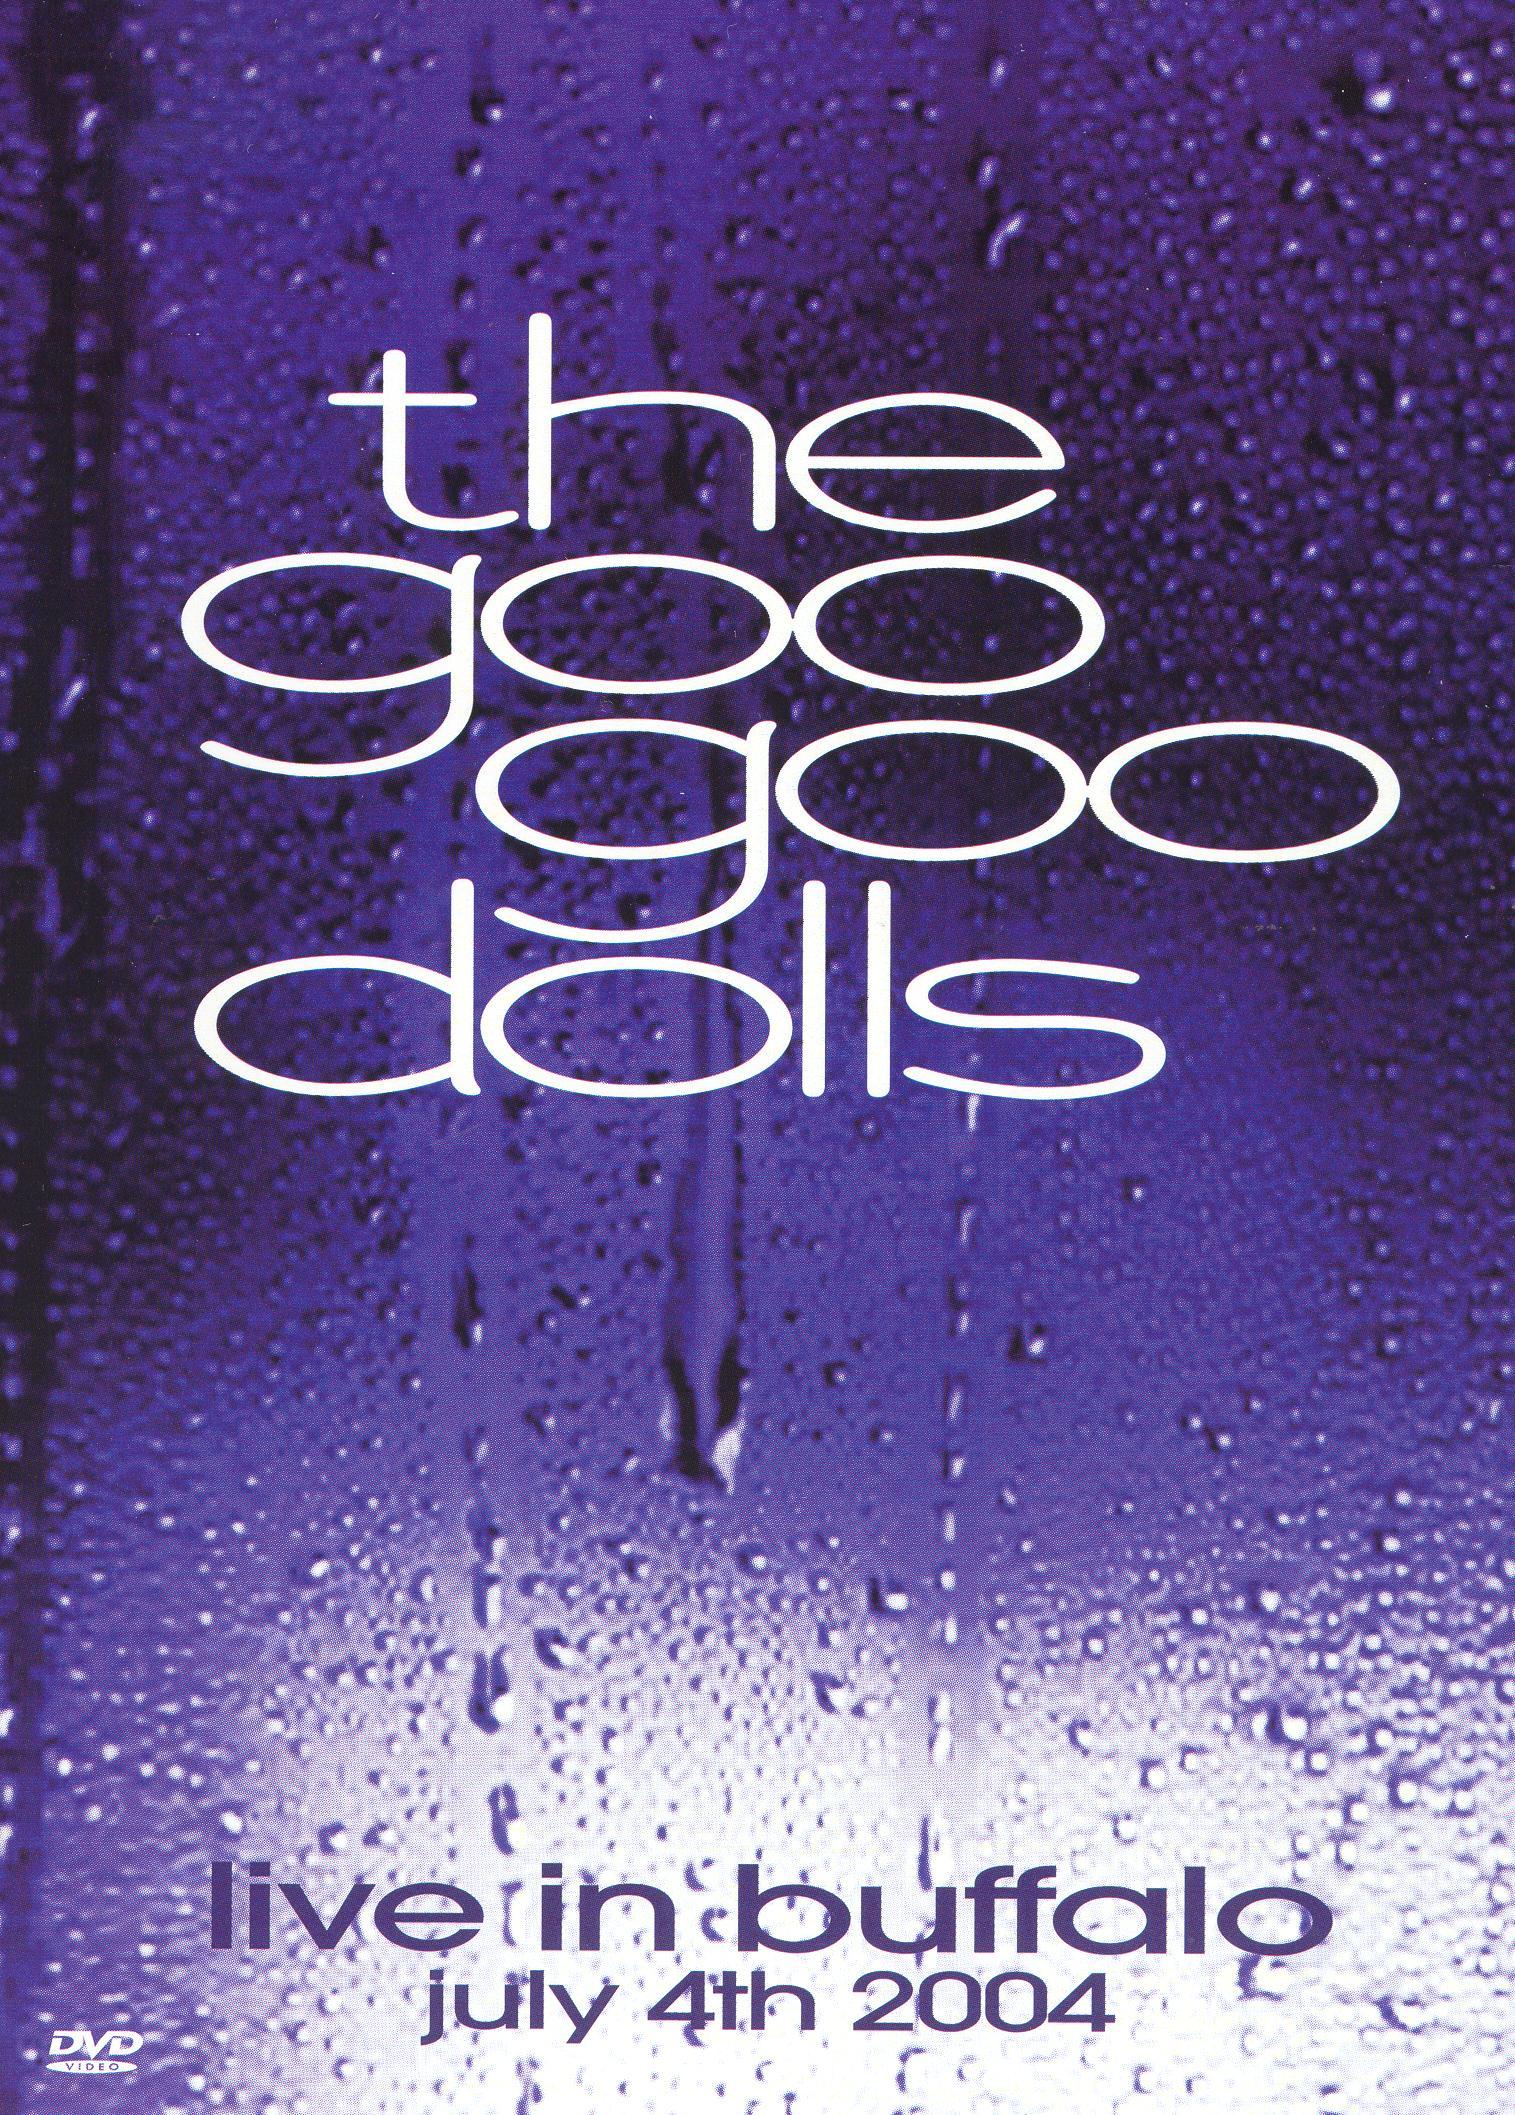 The Goo Goo Dolls: Live in Buffalo